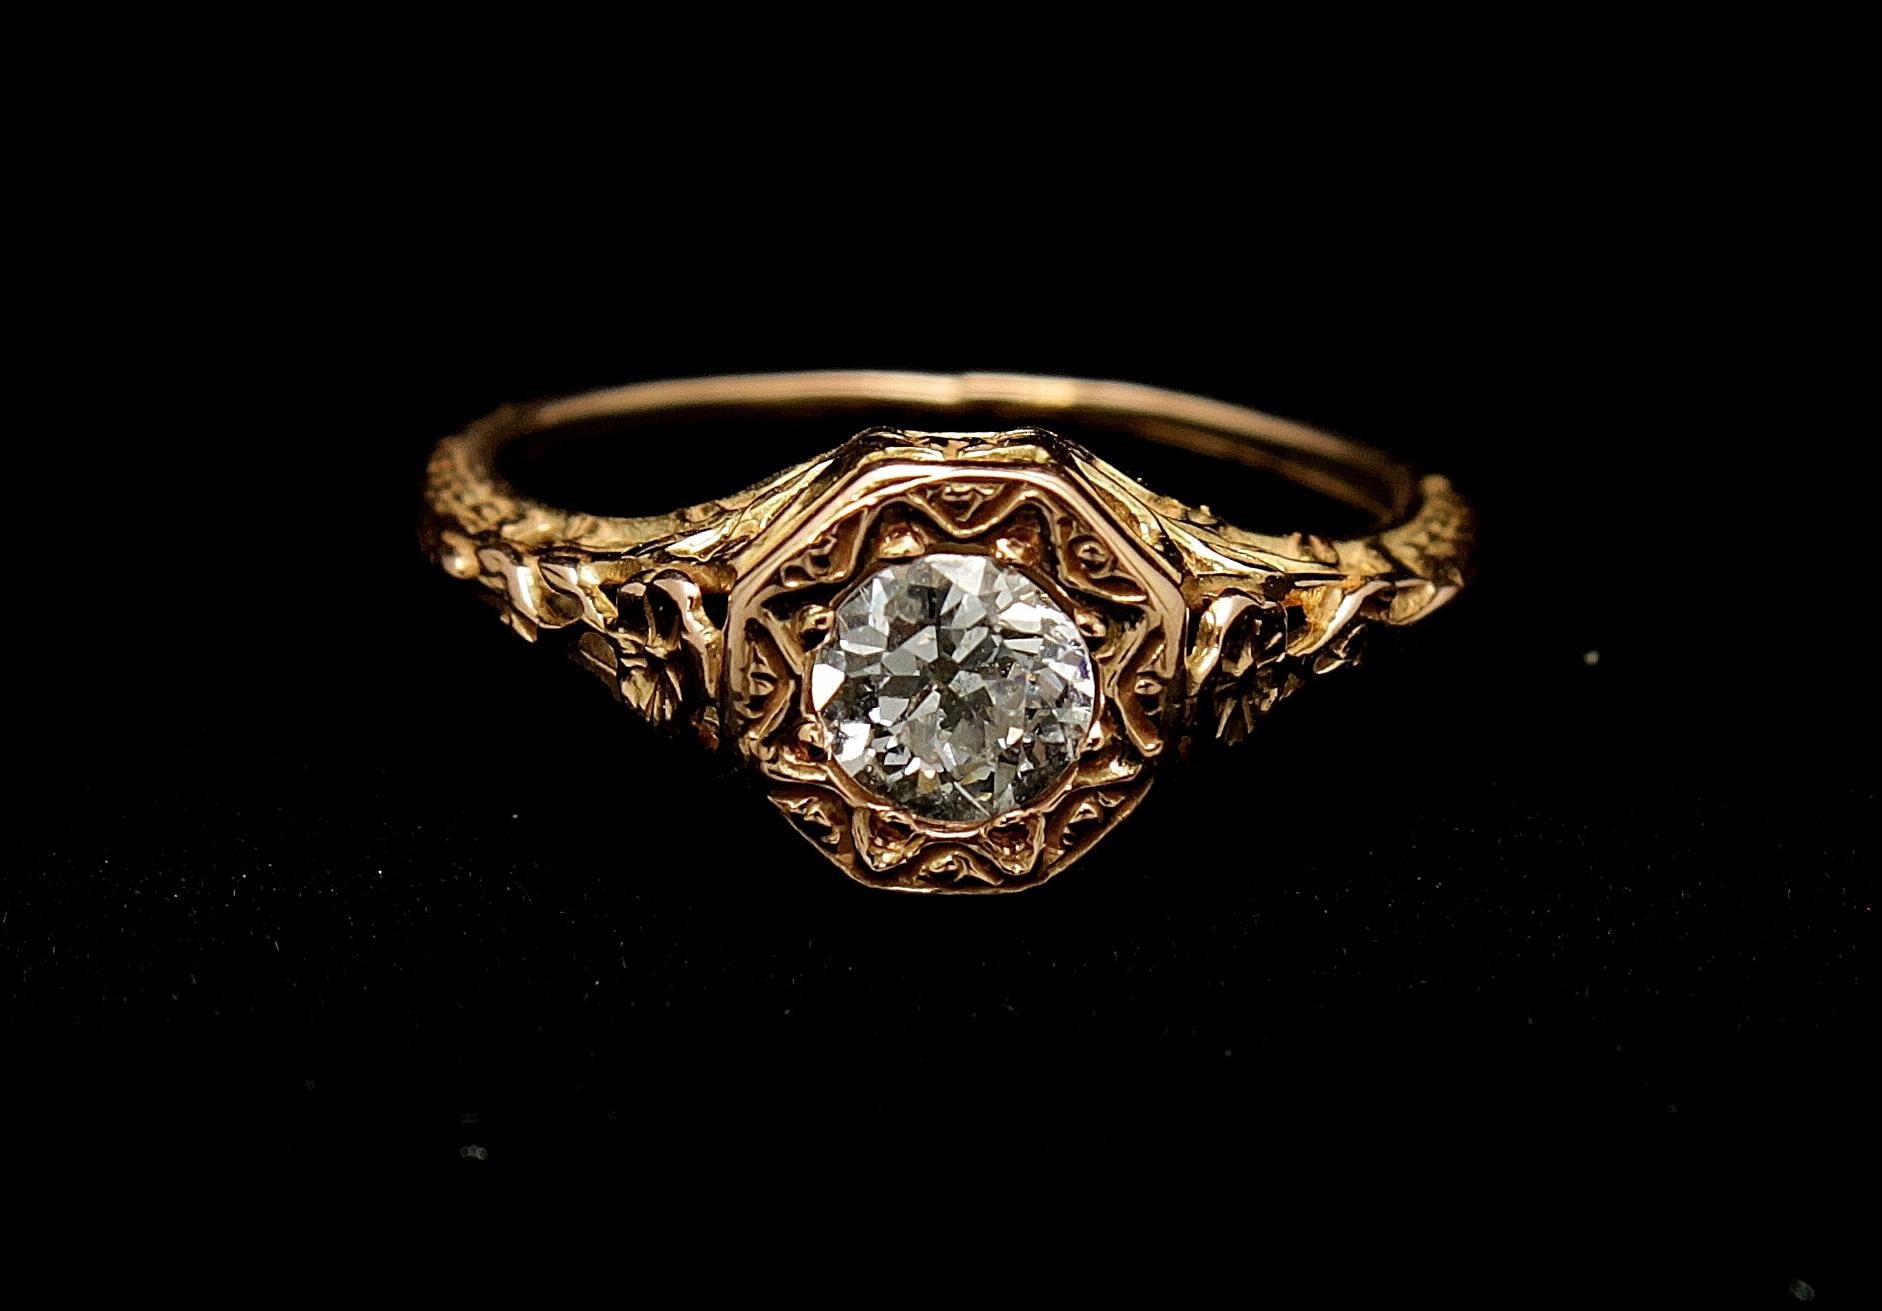 Antique 14kt Diamond Old Mine Cut .70cts Ring